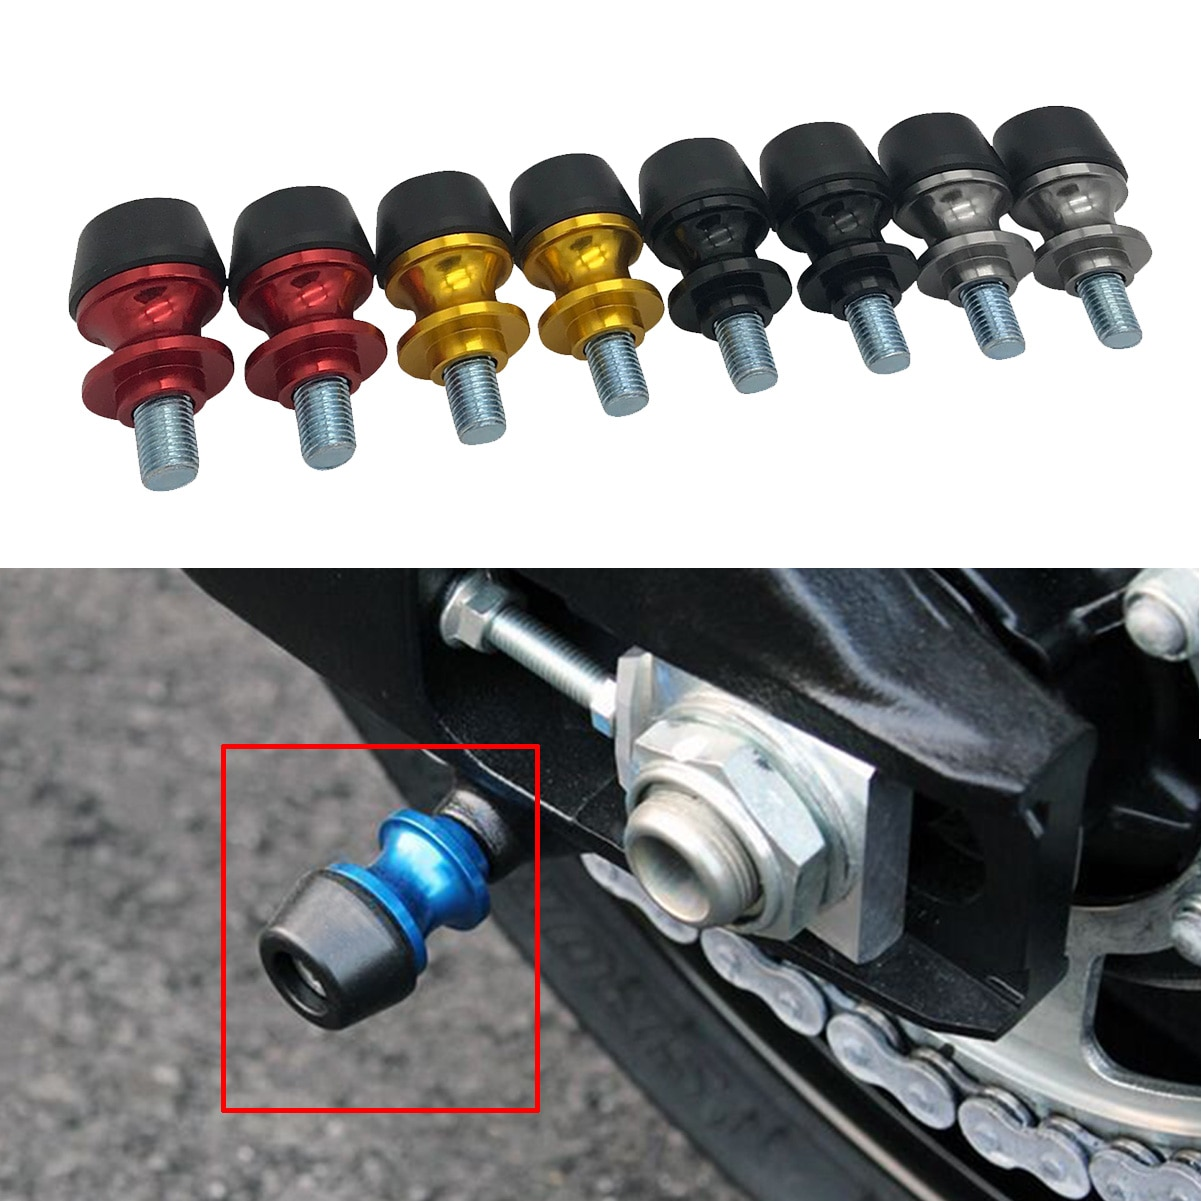 SEMSPEED CNC алюминиевые аксессуары для мотоциклов маятниковые Катушки слайдер для MSX 125 MSX125 CB1000R CBR650R CB650R CB650F CBR650F